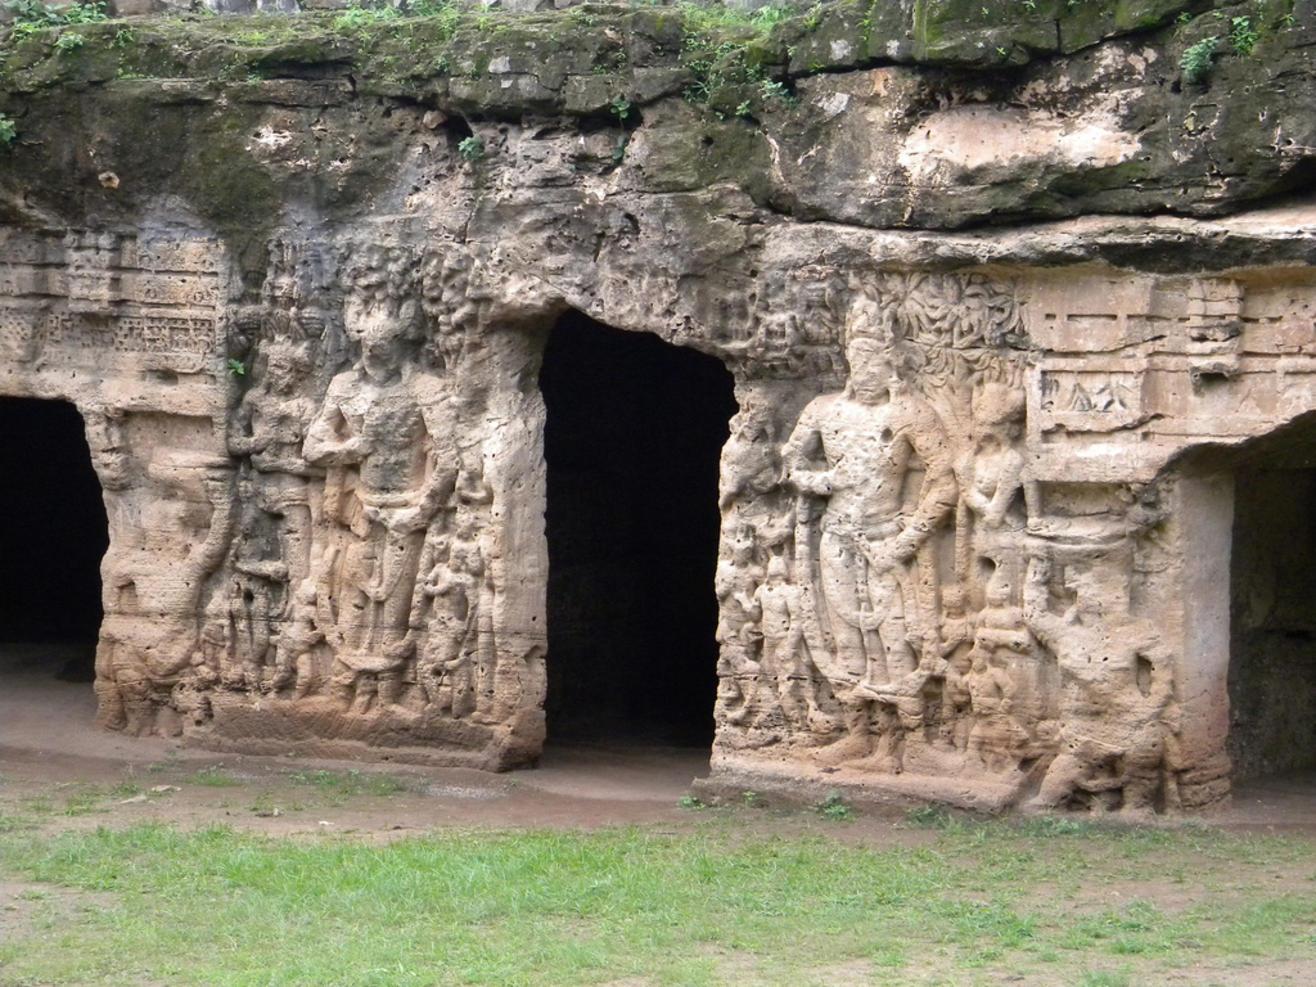 Junagadh Buddhist Cave Groups, Junagadh